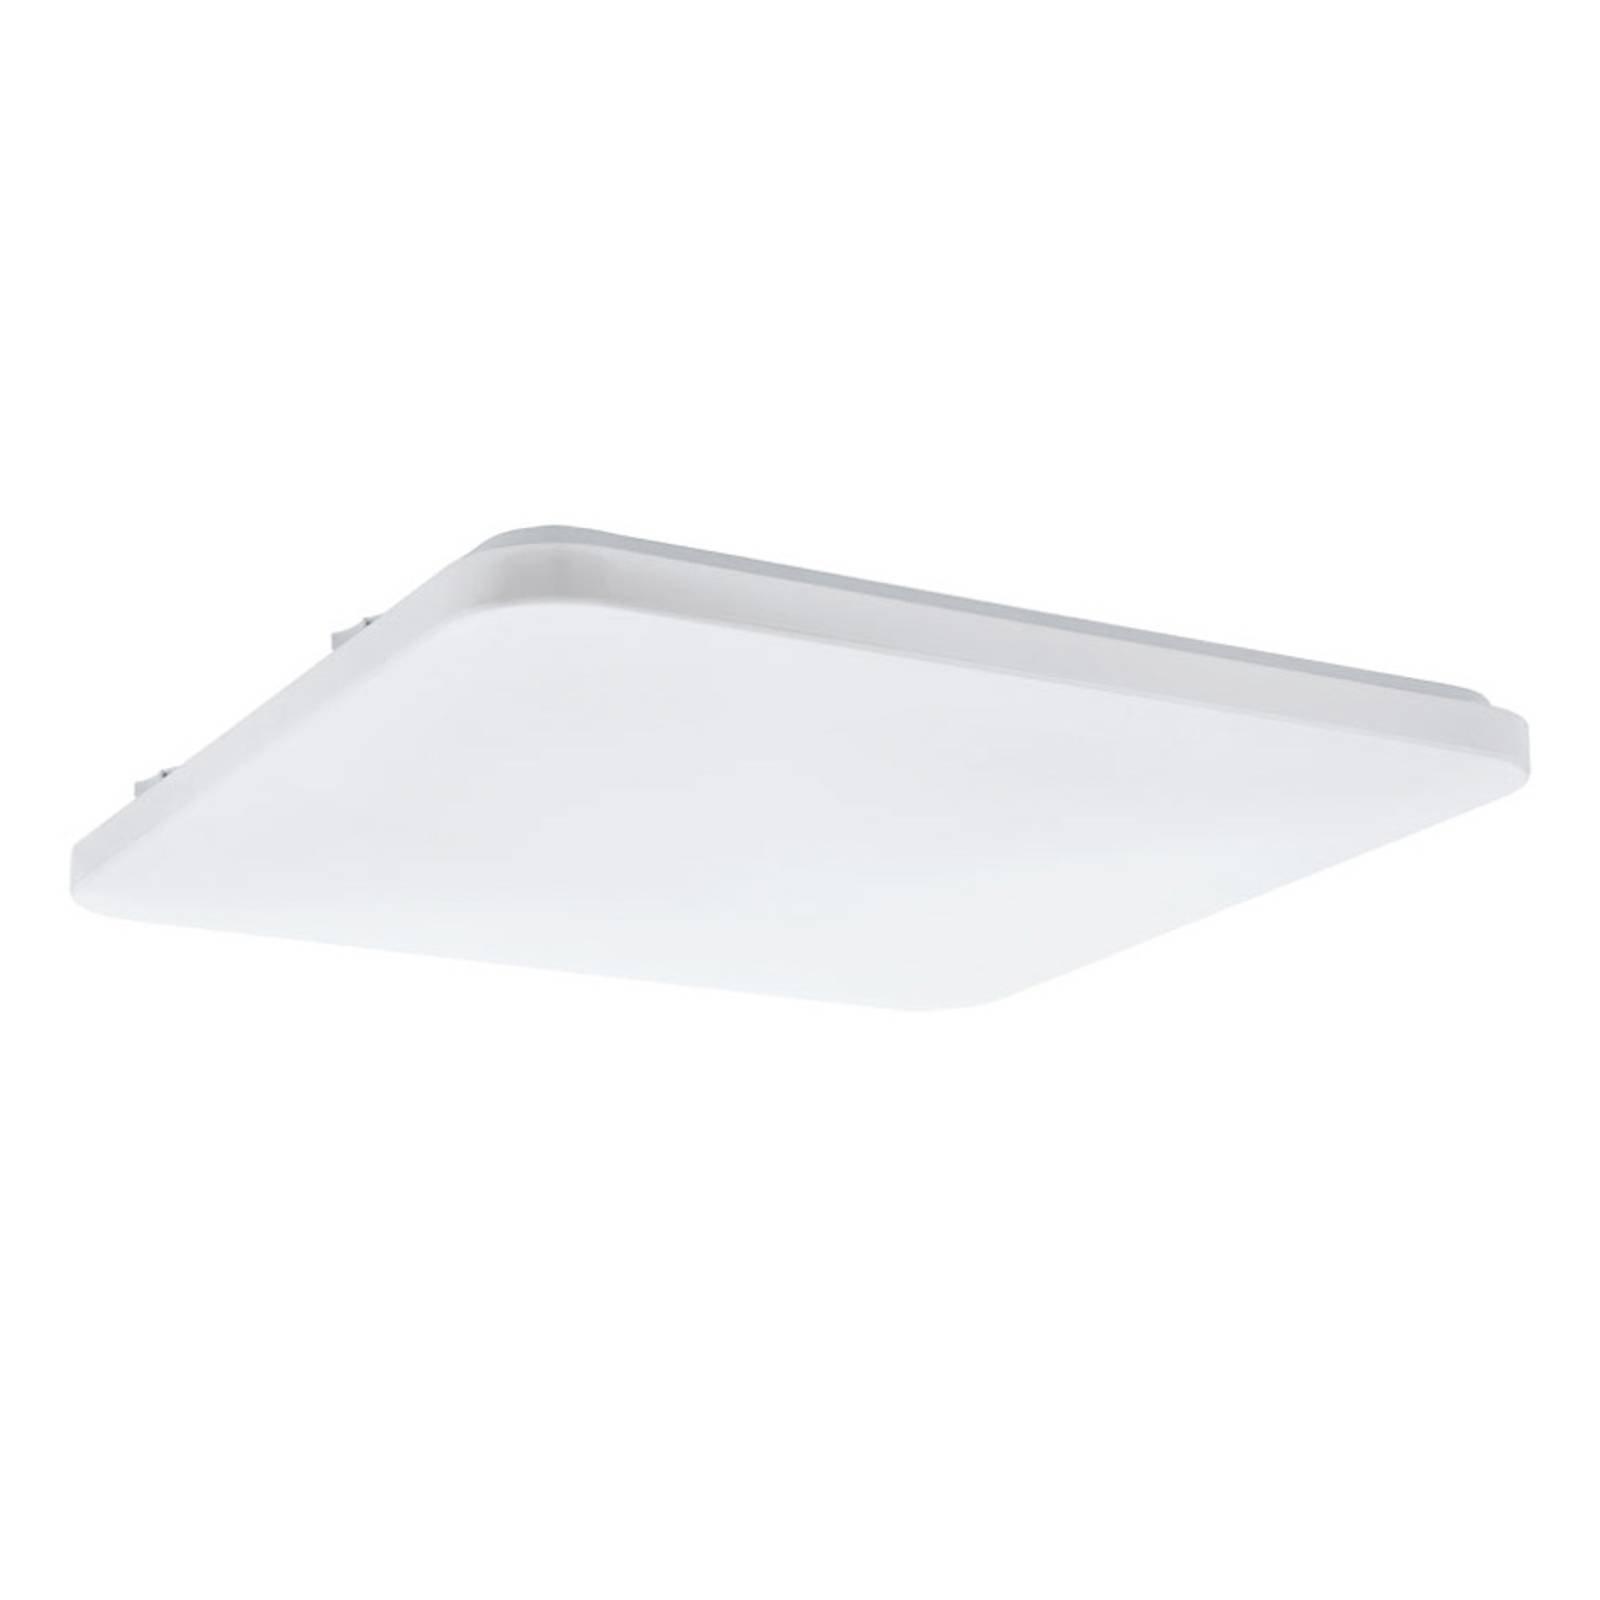 LED-taklampe Frania kantet